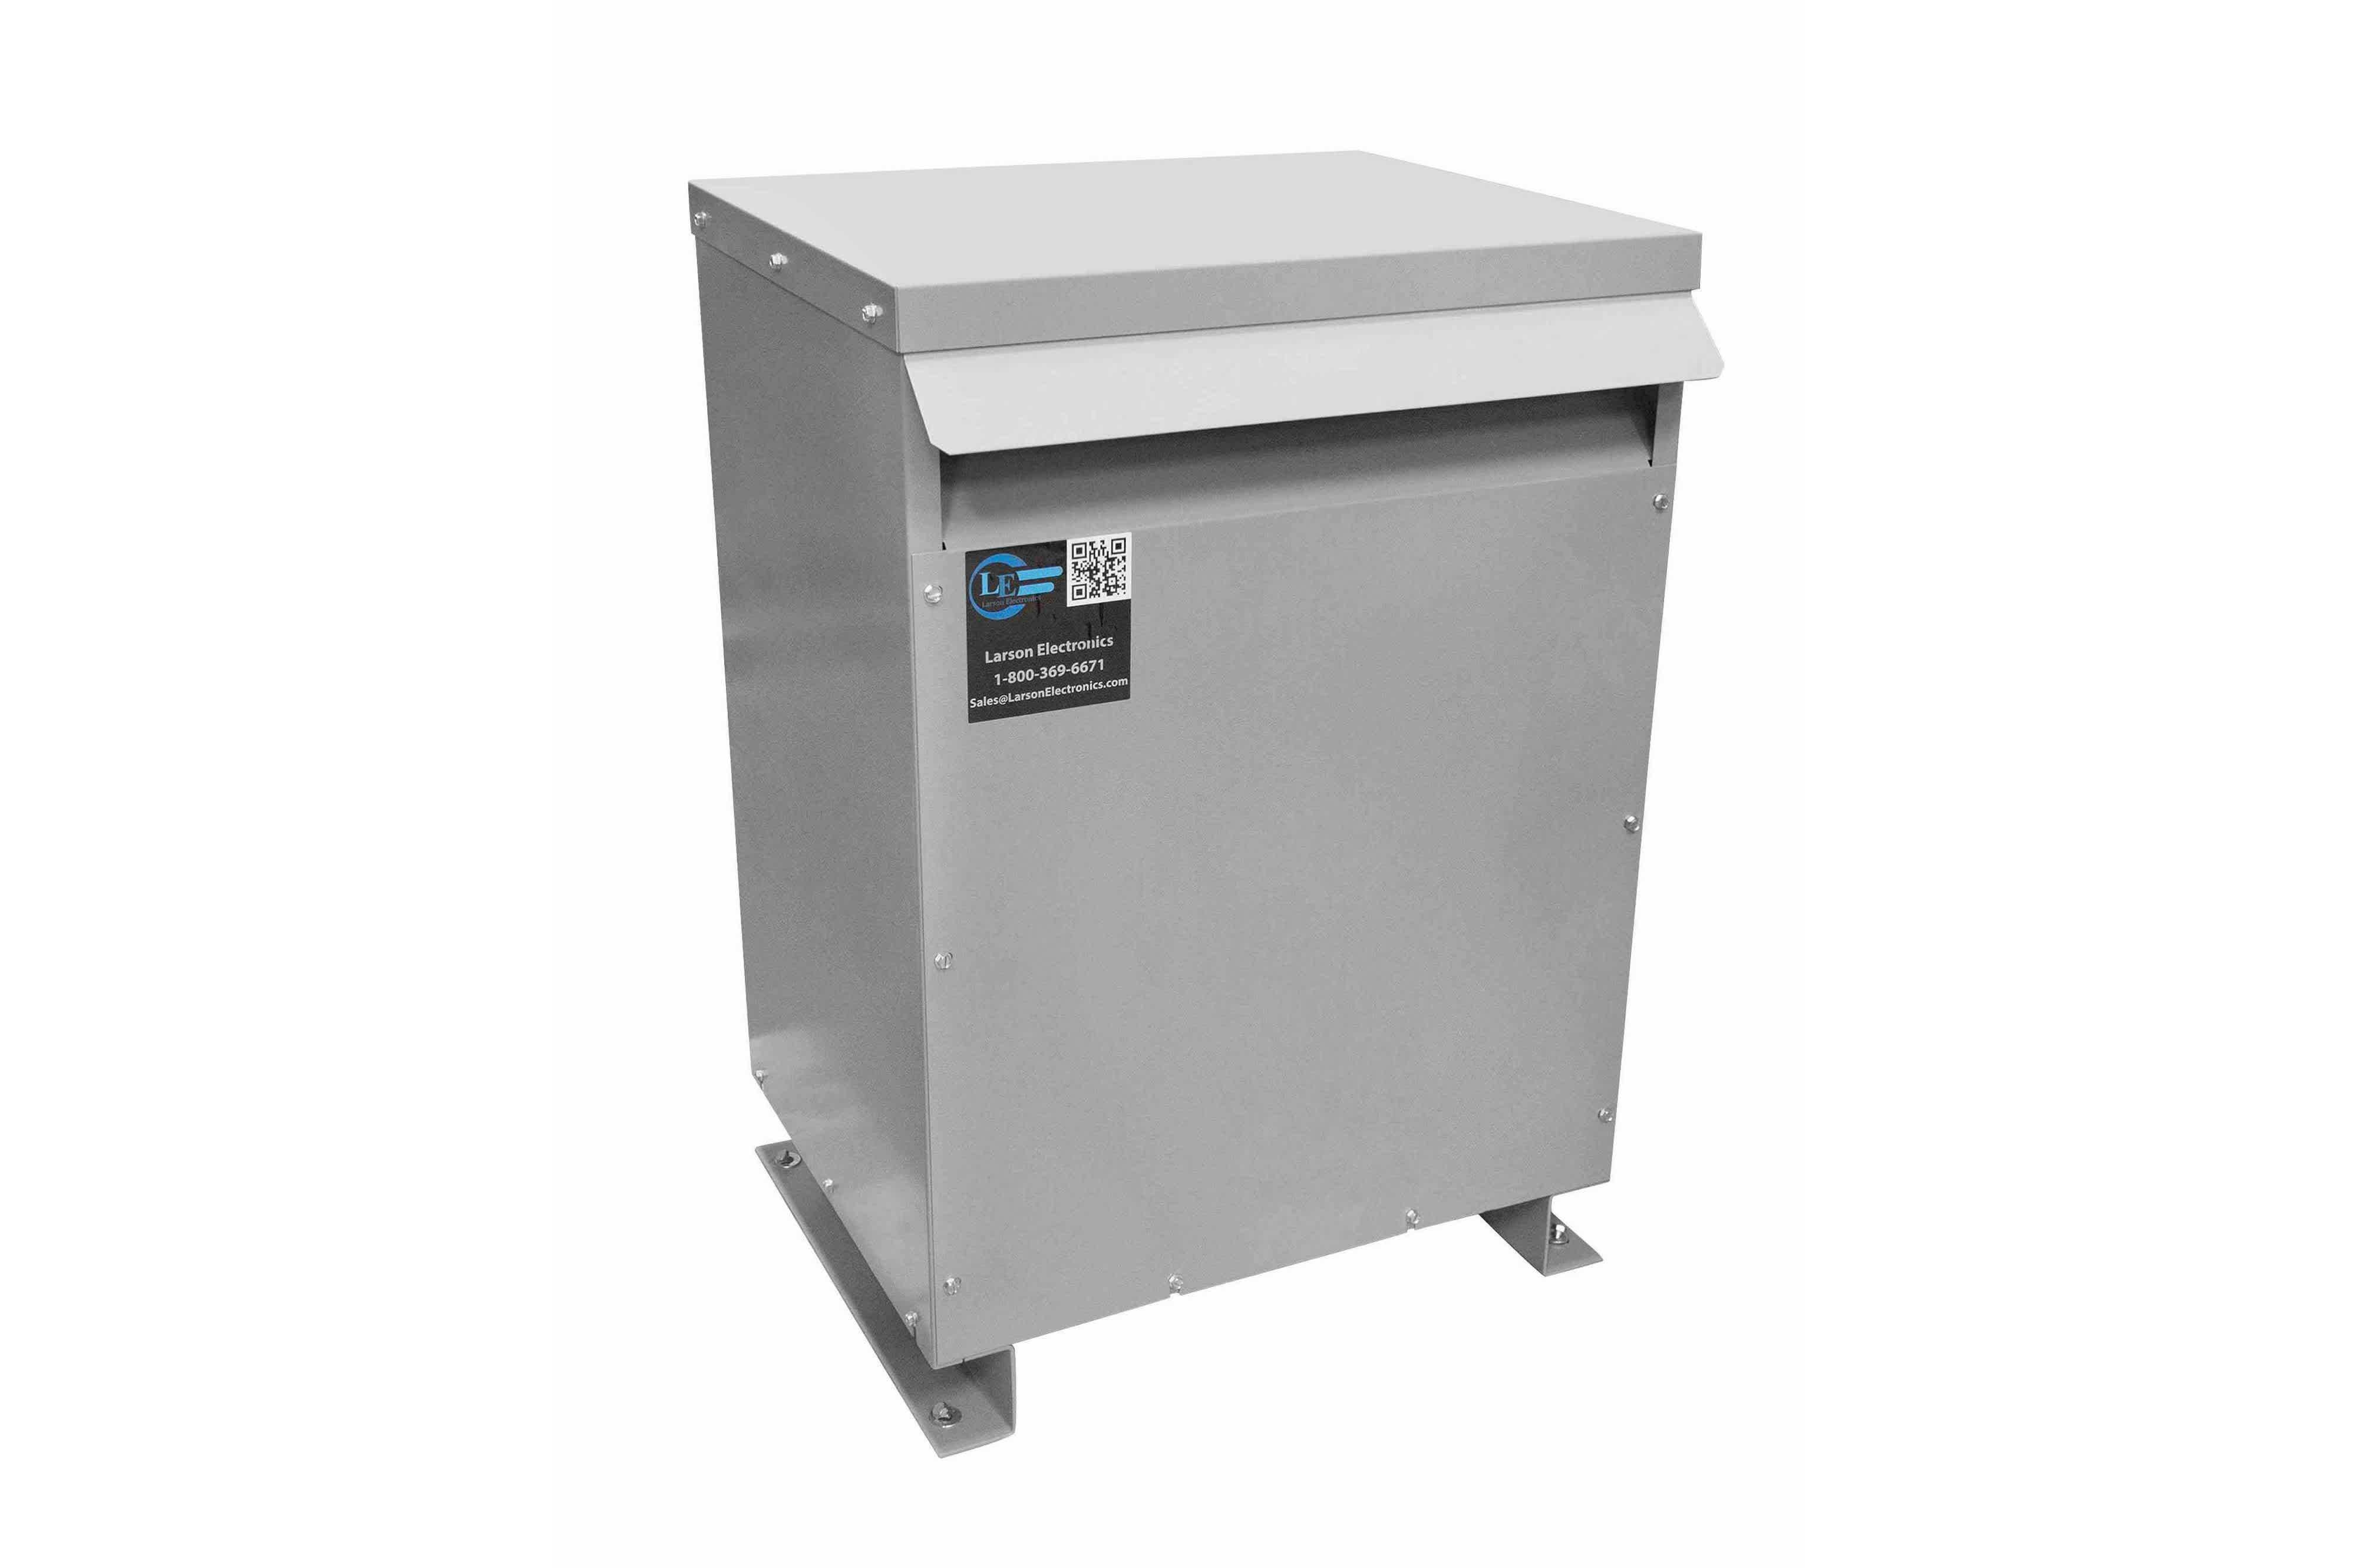 38 kVA 3PH Isolation Transformer, 240V Wye Primary, 600V Delta Secondary, N3R, Ventilated, 60 Hz